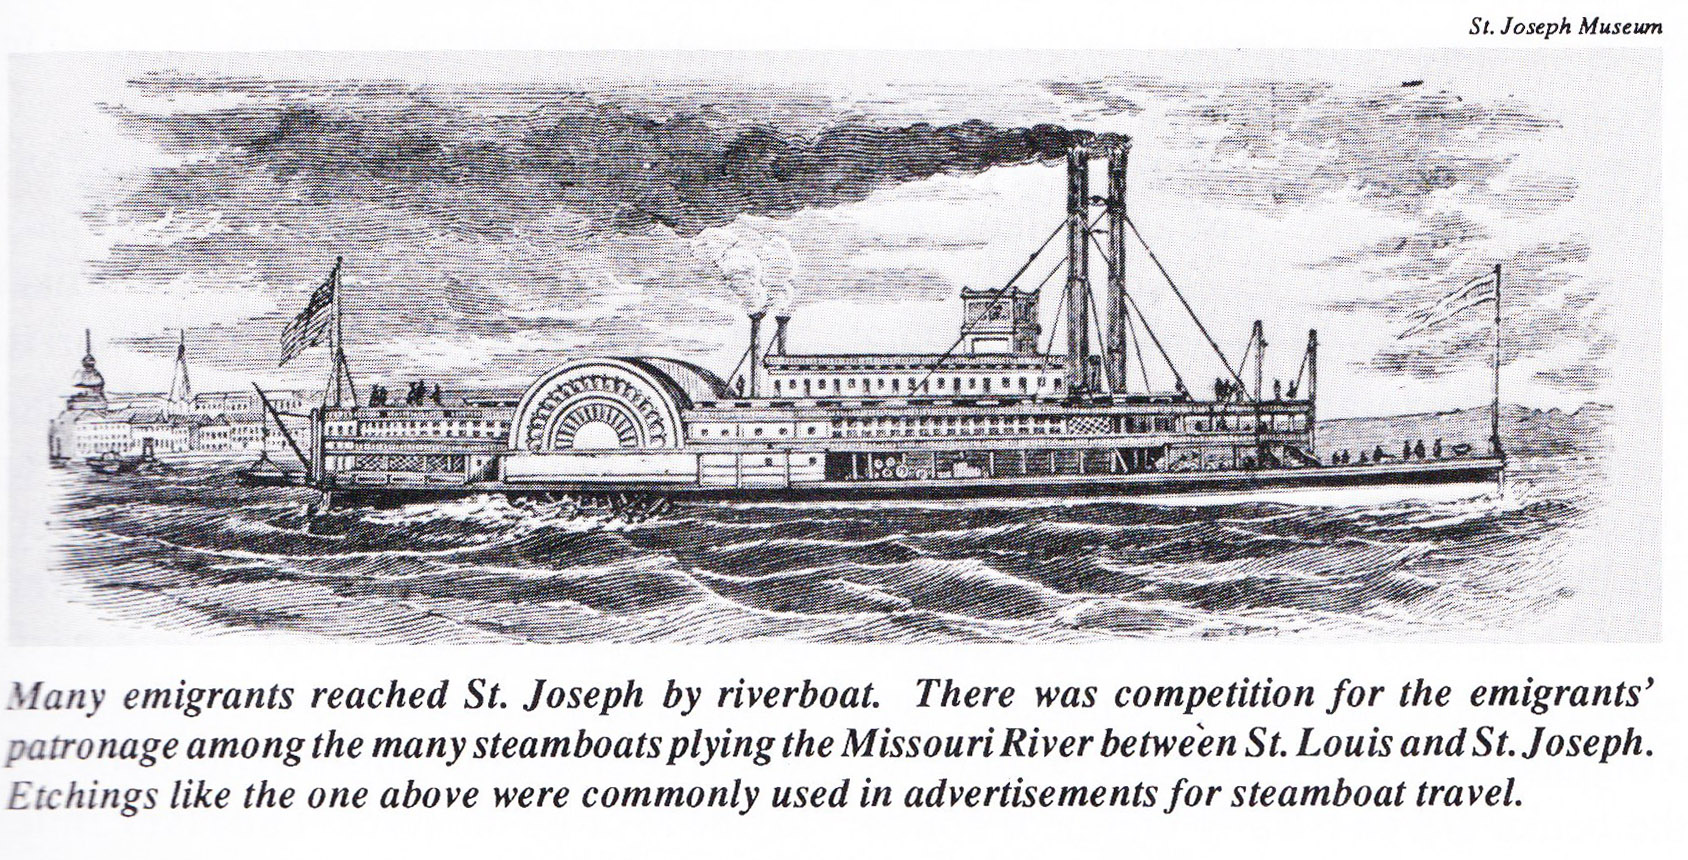 st. joe steam boat 001.jpg